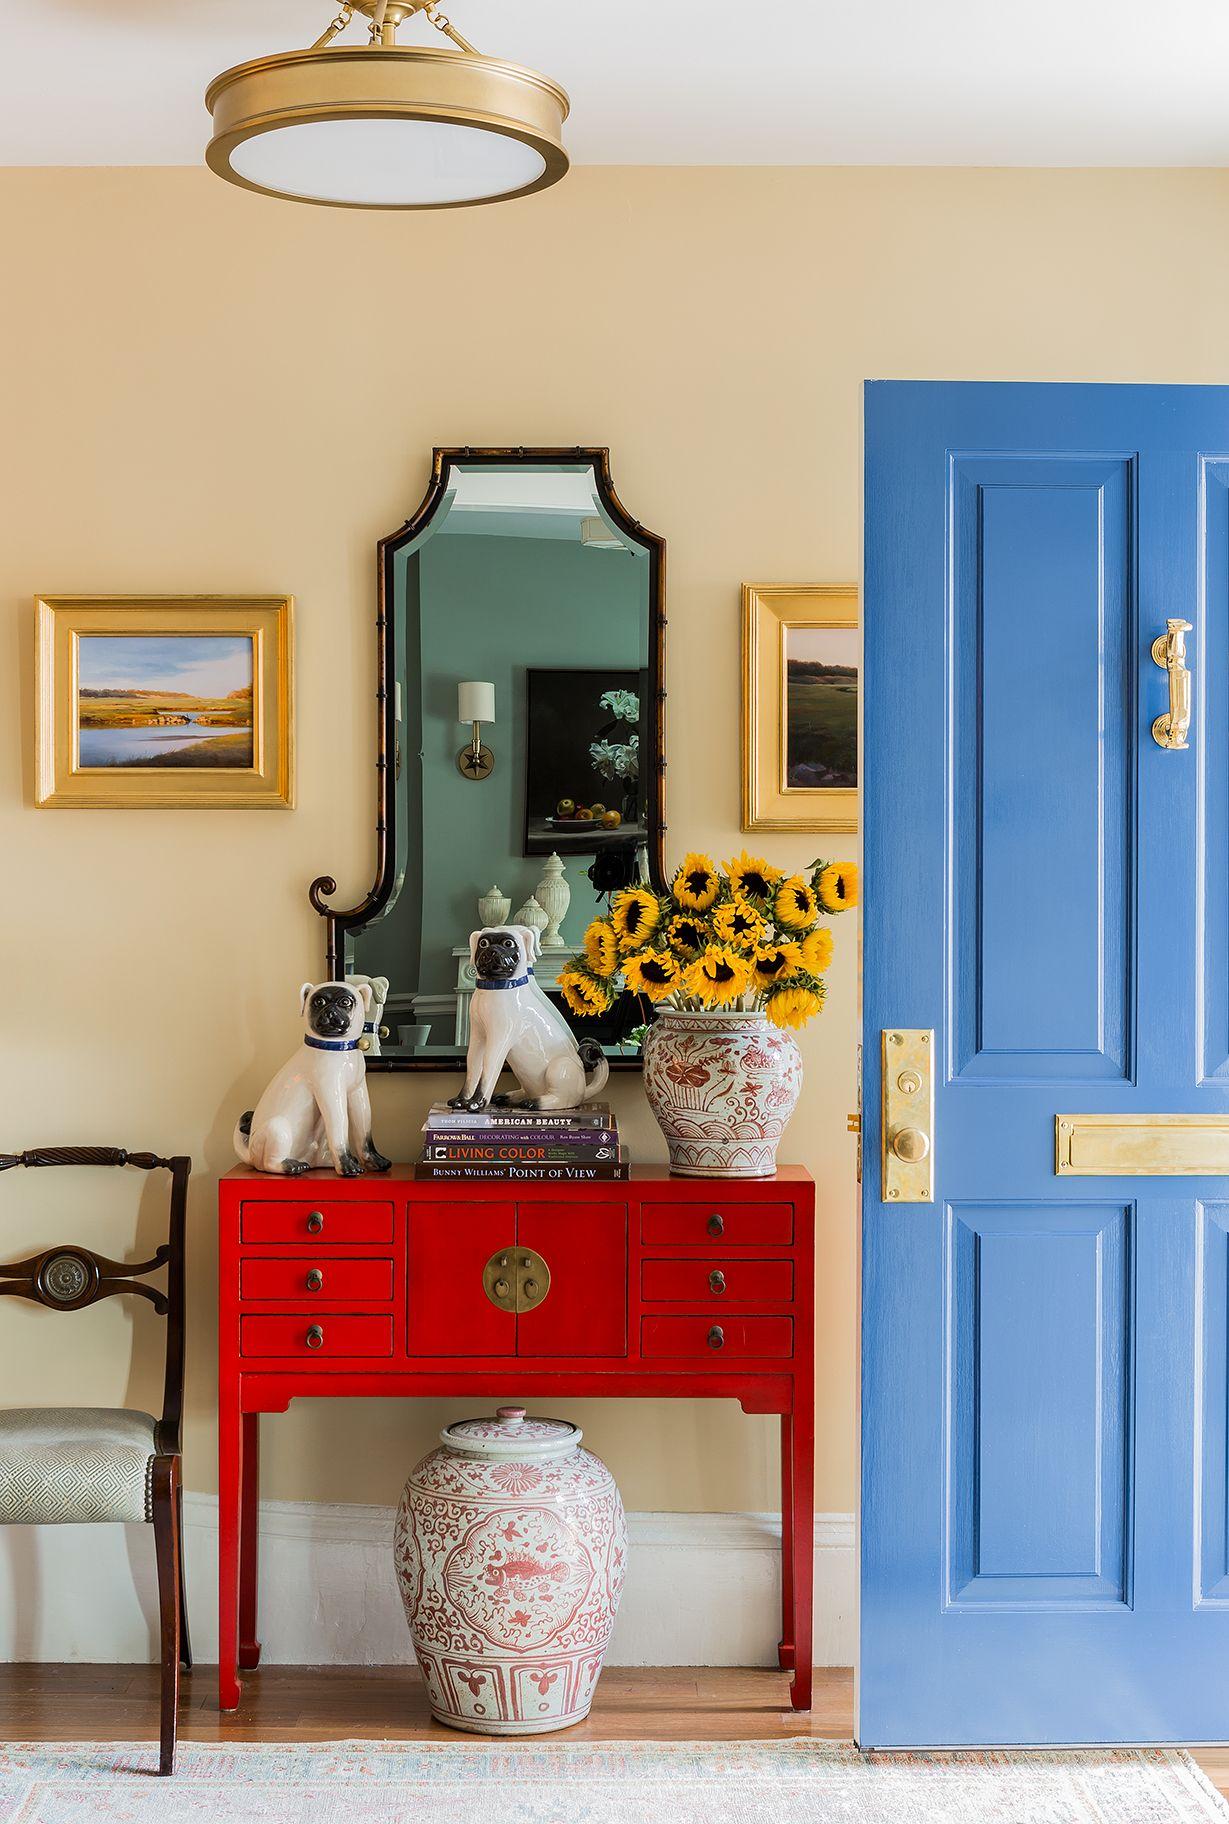 Interiors K Marshall Design Fine Kitchens Baths Entry Table Decor Entry Table Entry Tables